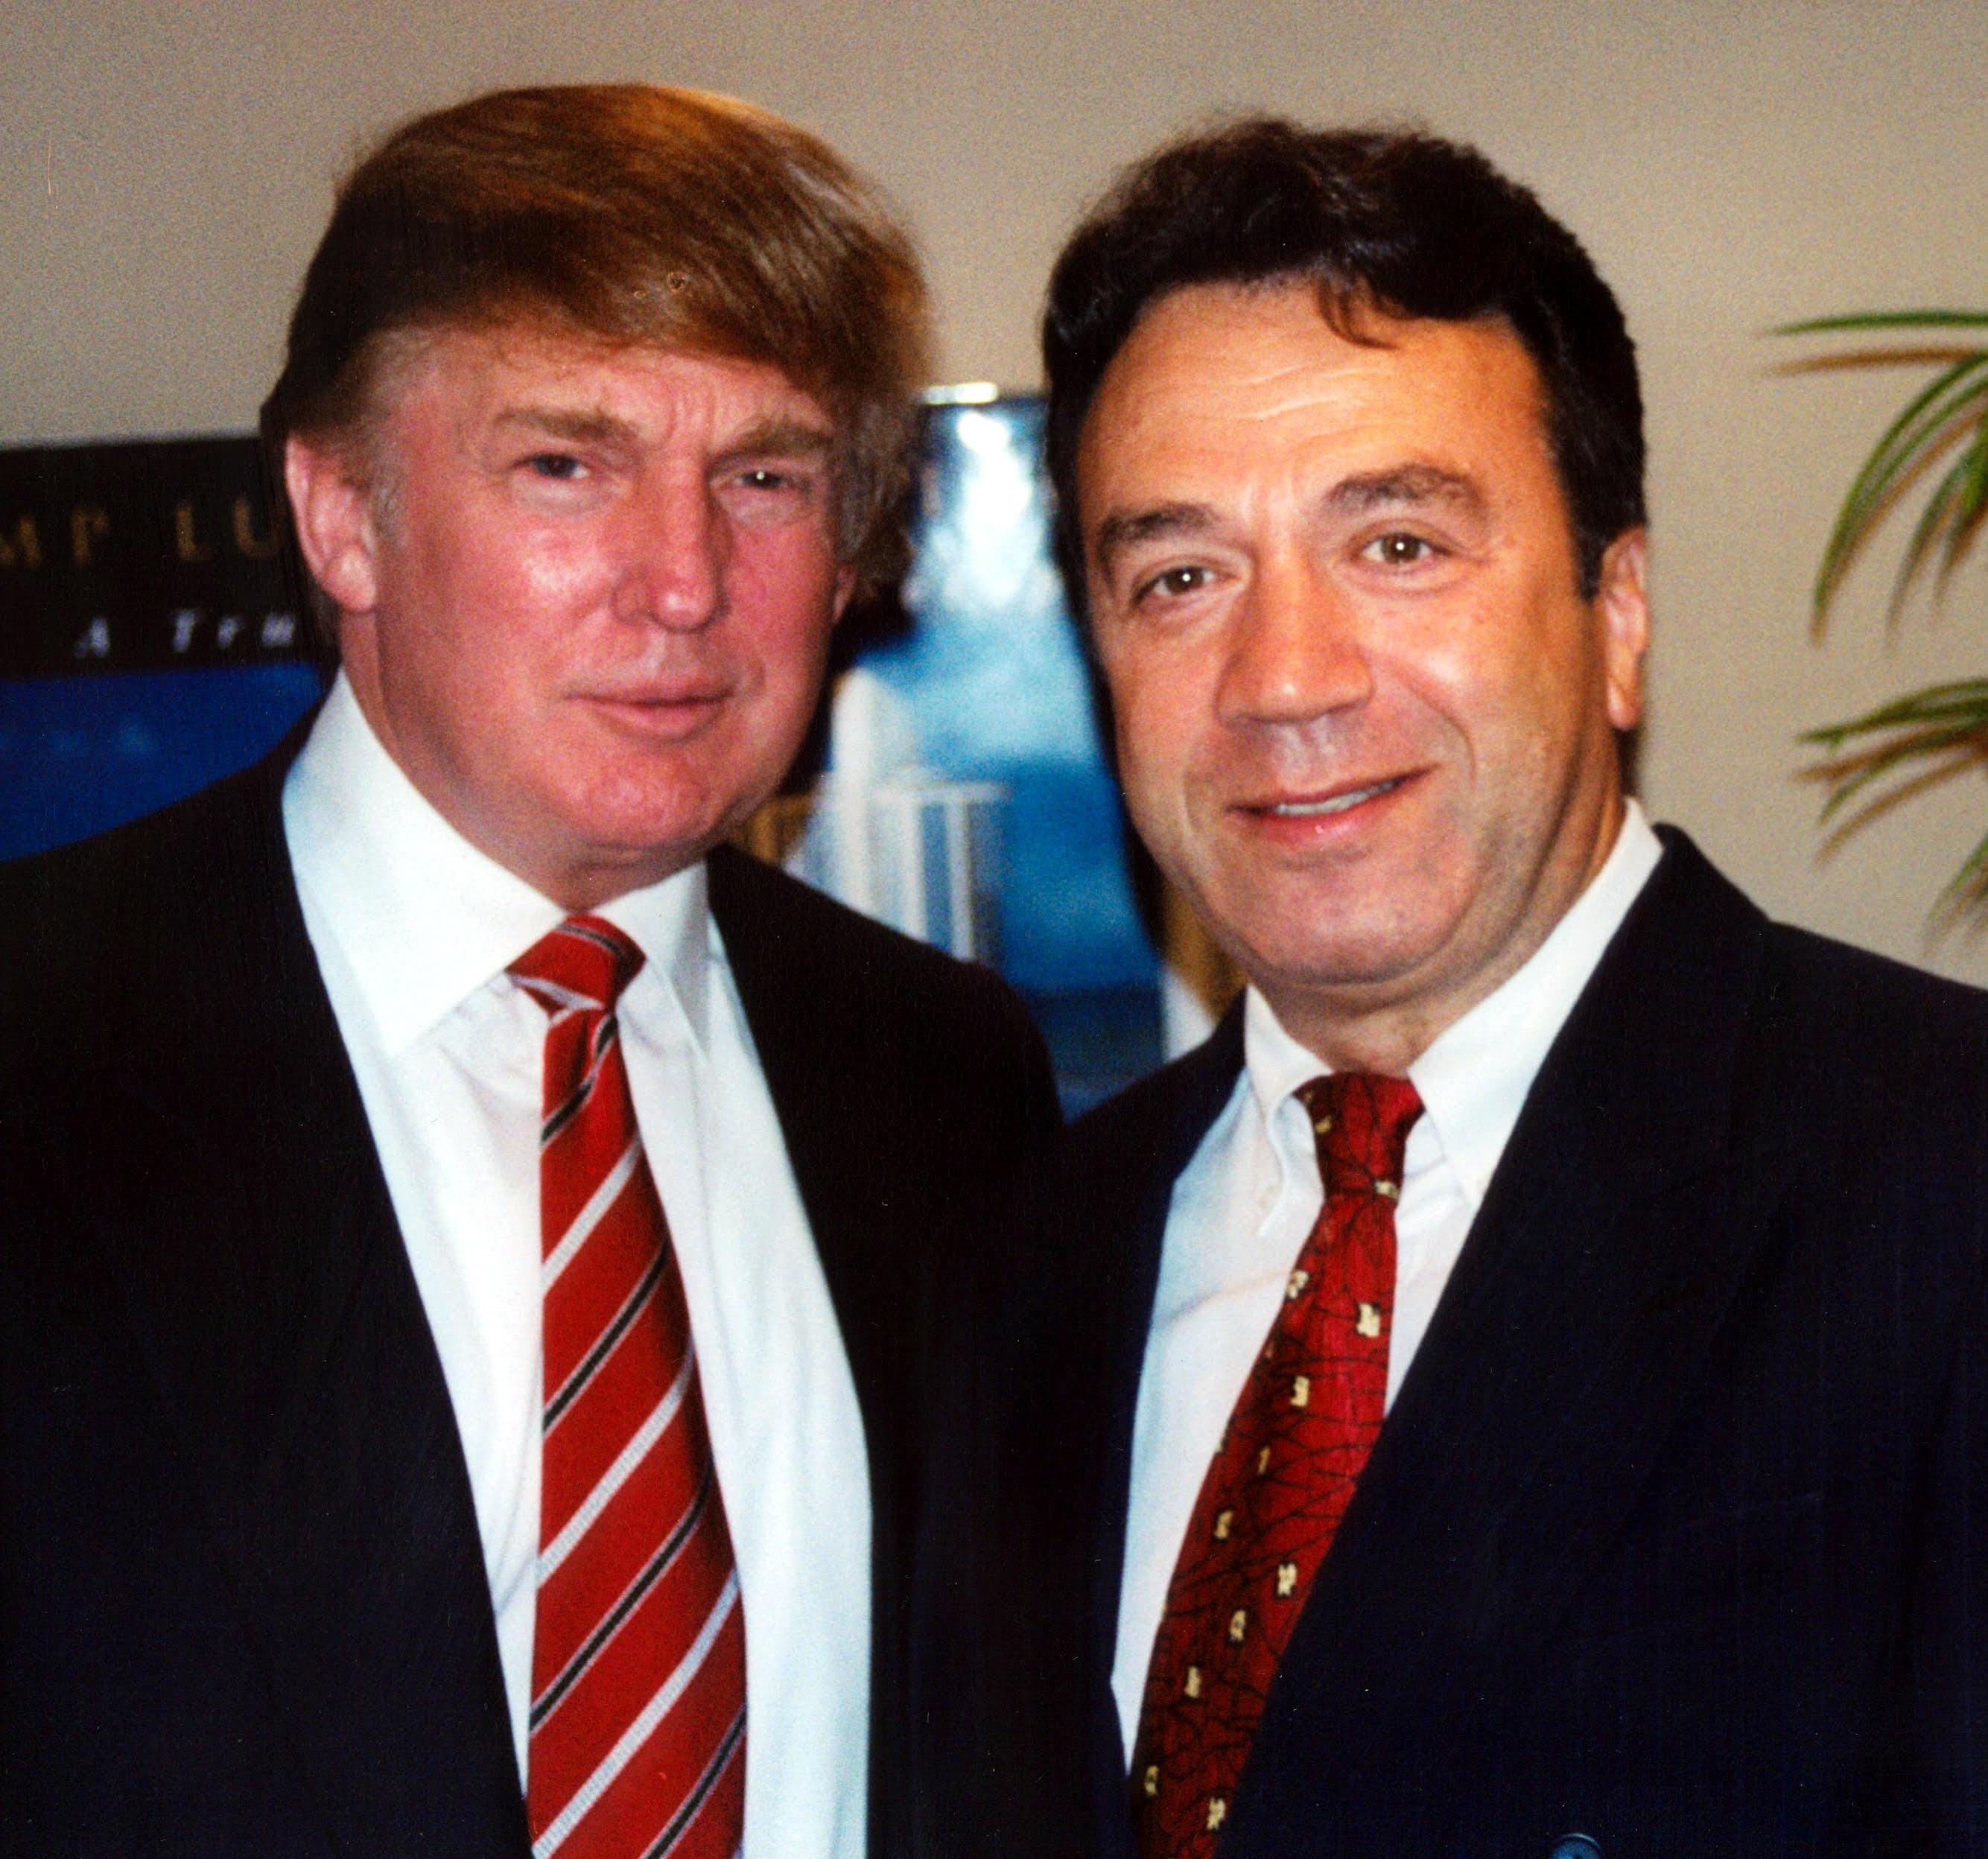 Donald Trump & Roman